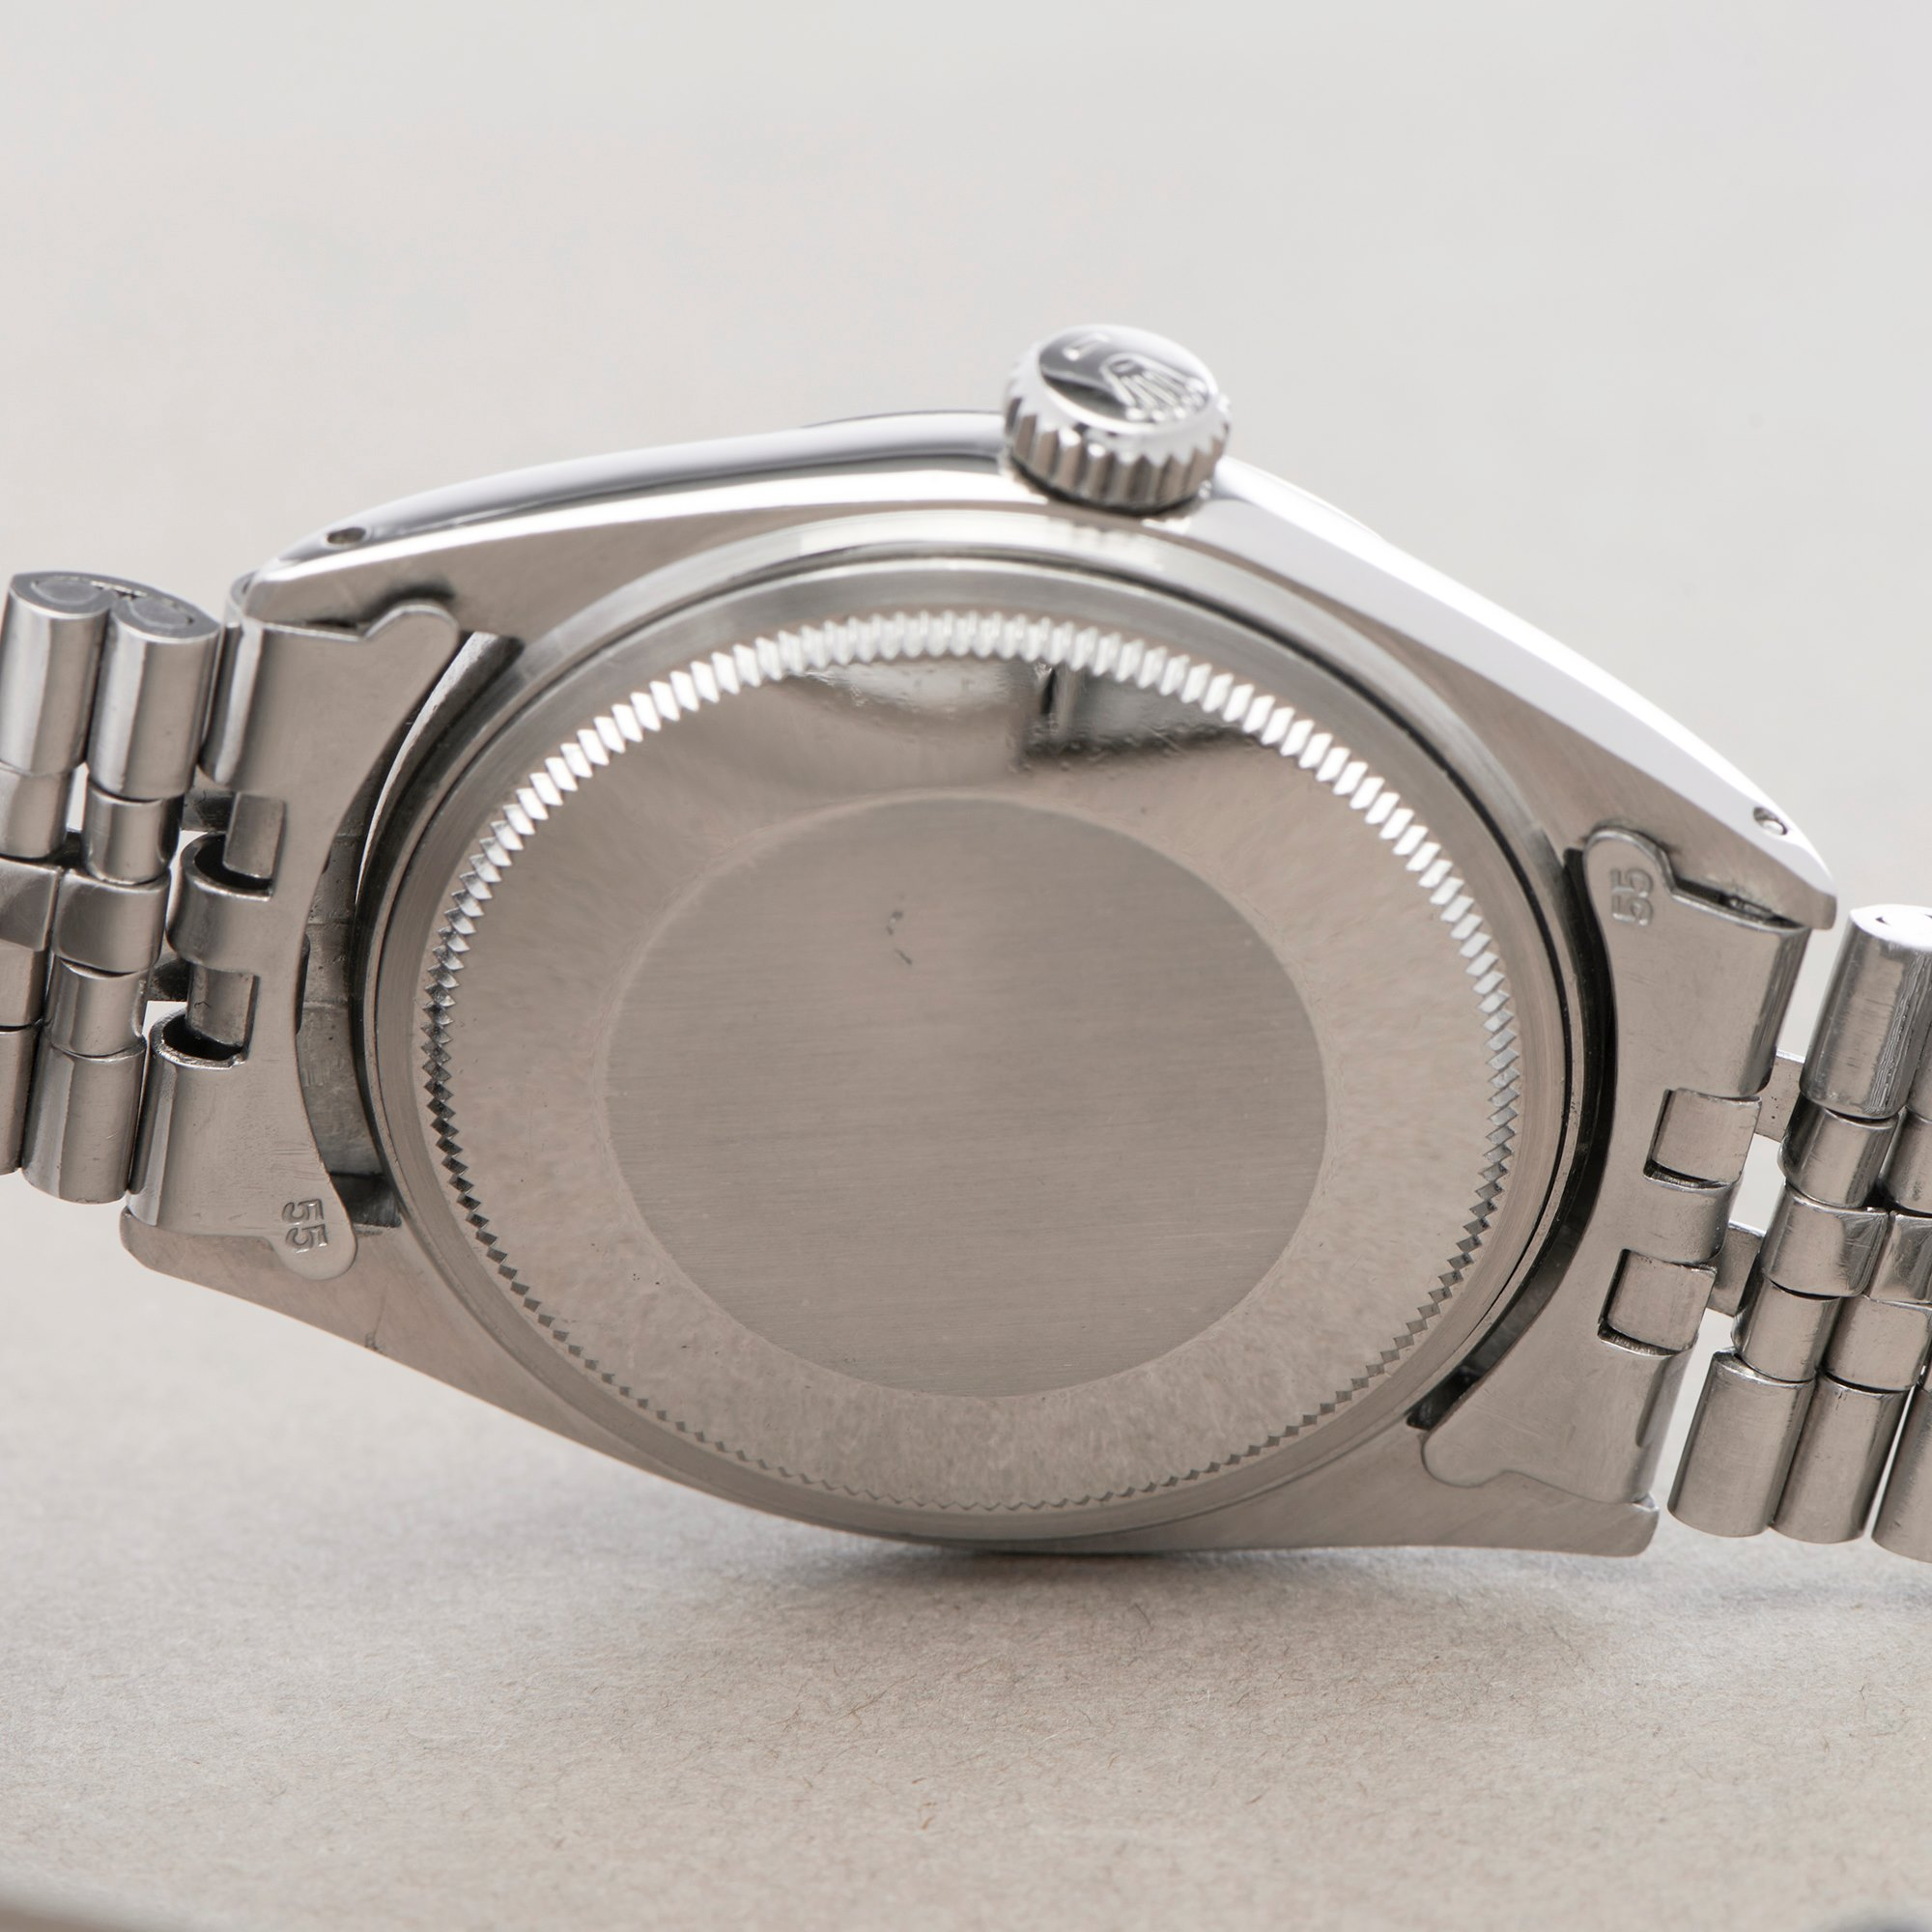 Rolex Datejust 36 Stainless Steel 1601